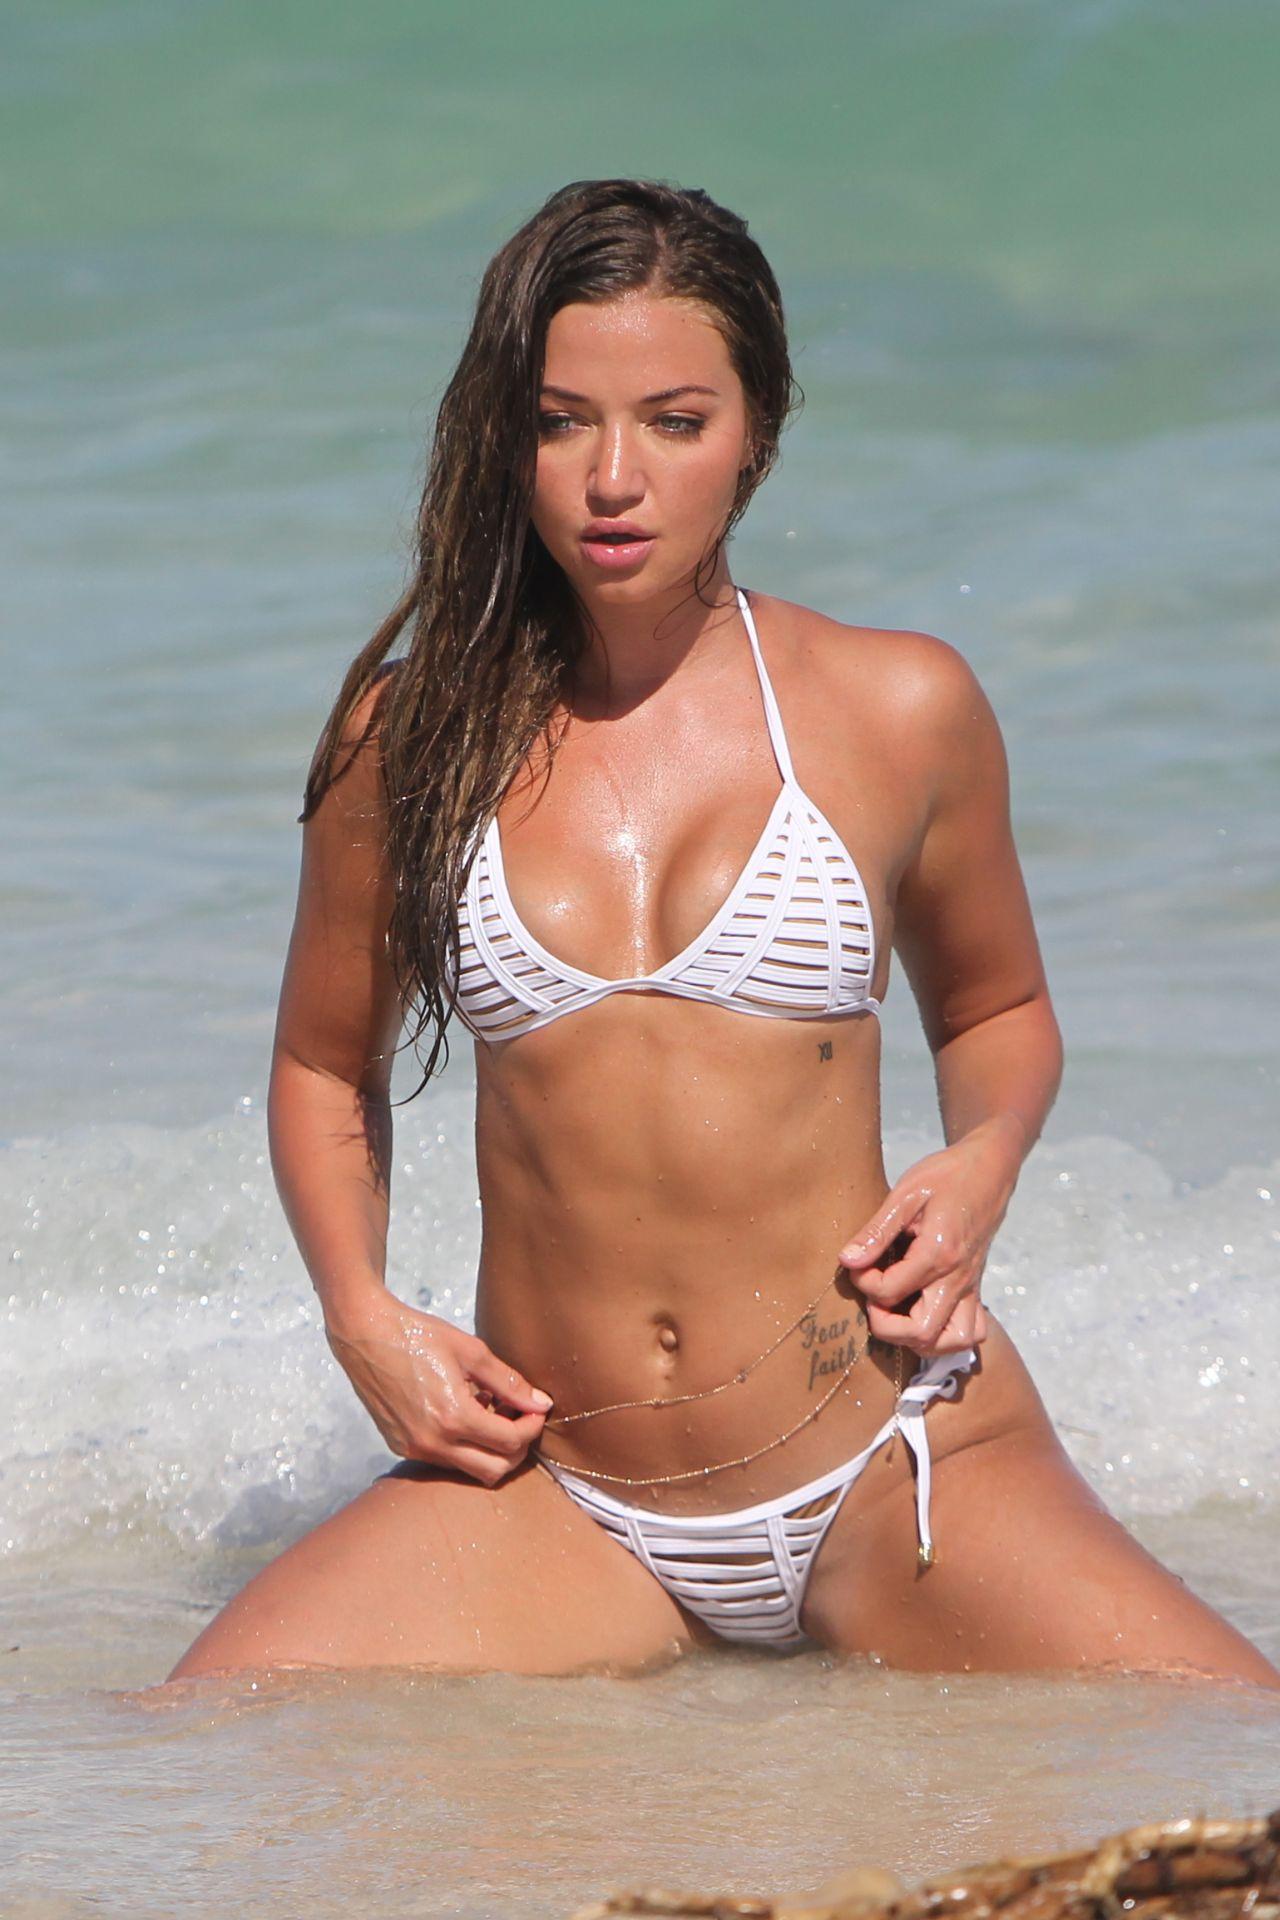 Erika Costell Bikini Photoshoot - Miami Beach 09012017-8021